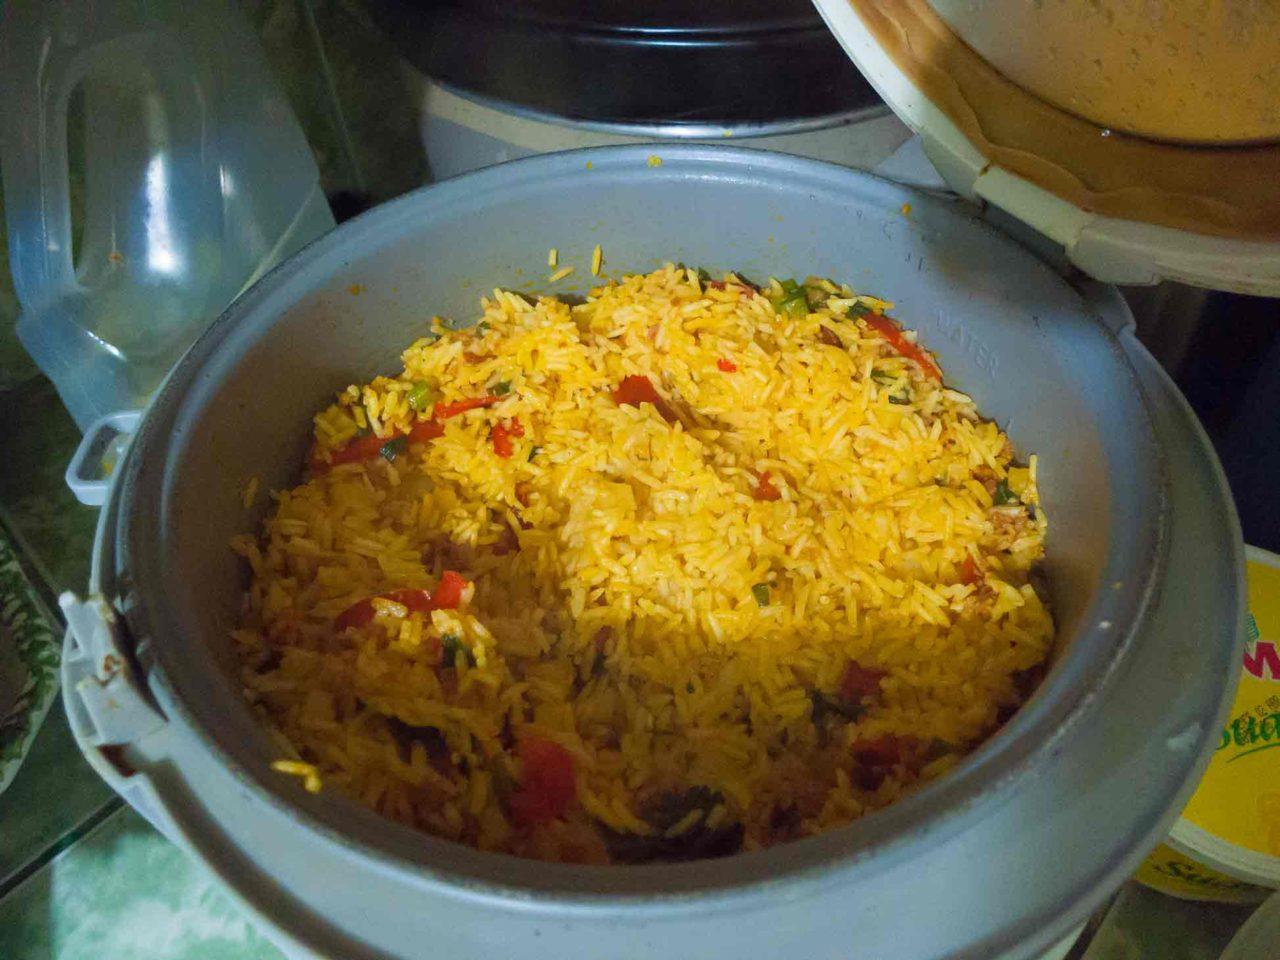 Costa Rican Tamales - saffron rice mixture. Recipe with photos